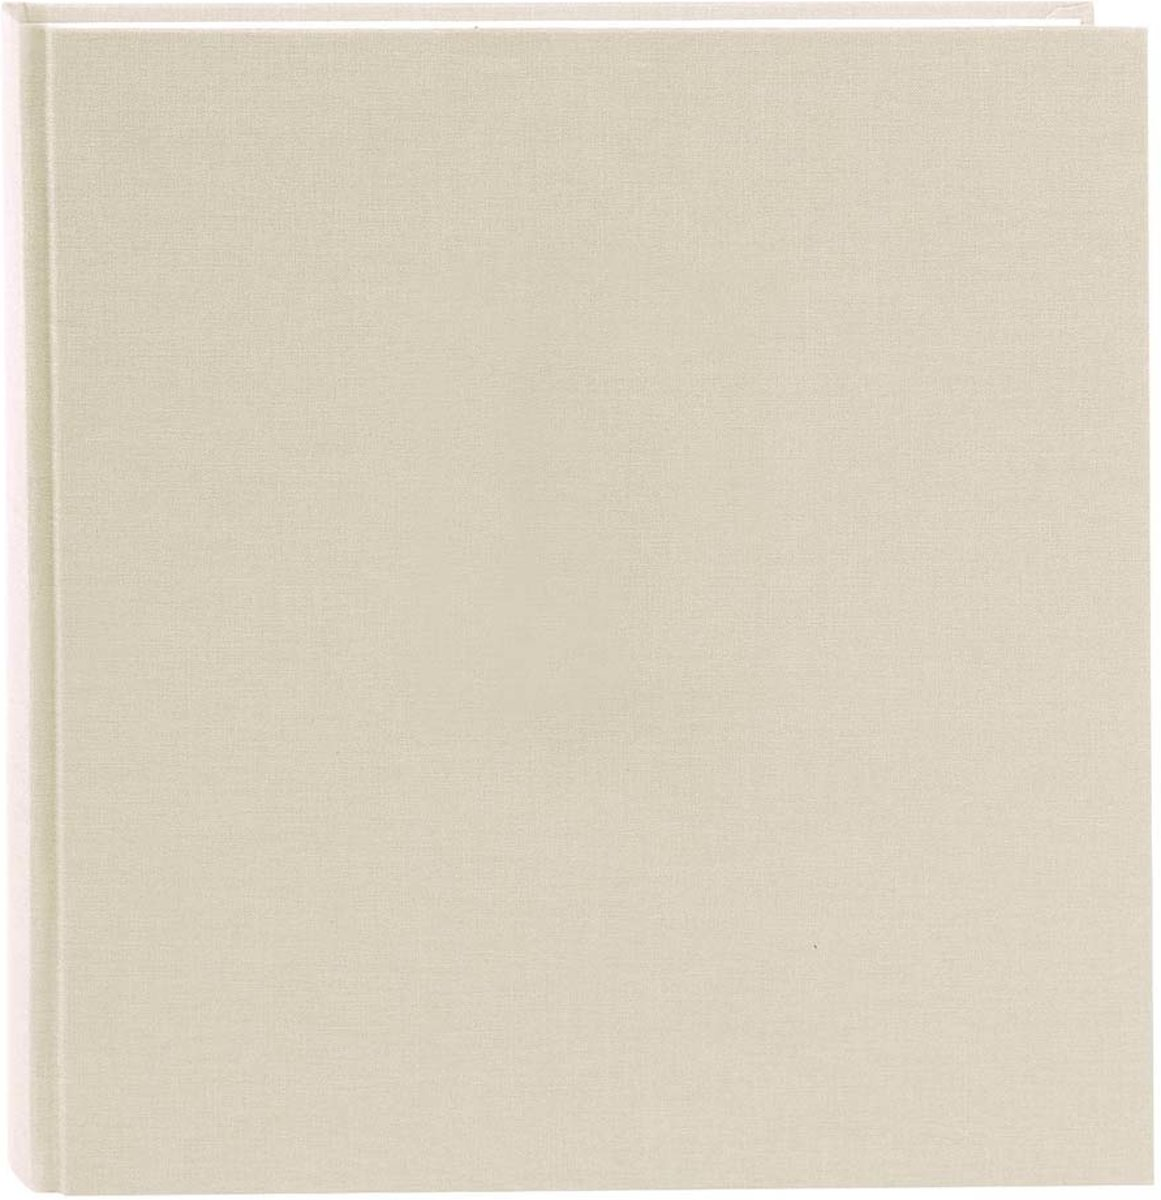 GOLDBUCH GOL-27605 fotoalbum SUMMERTIME Trend 2 beige - groot